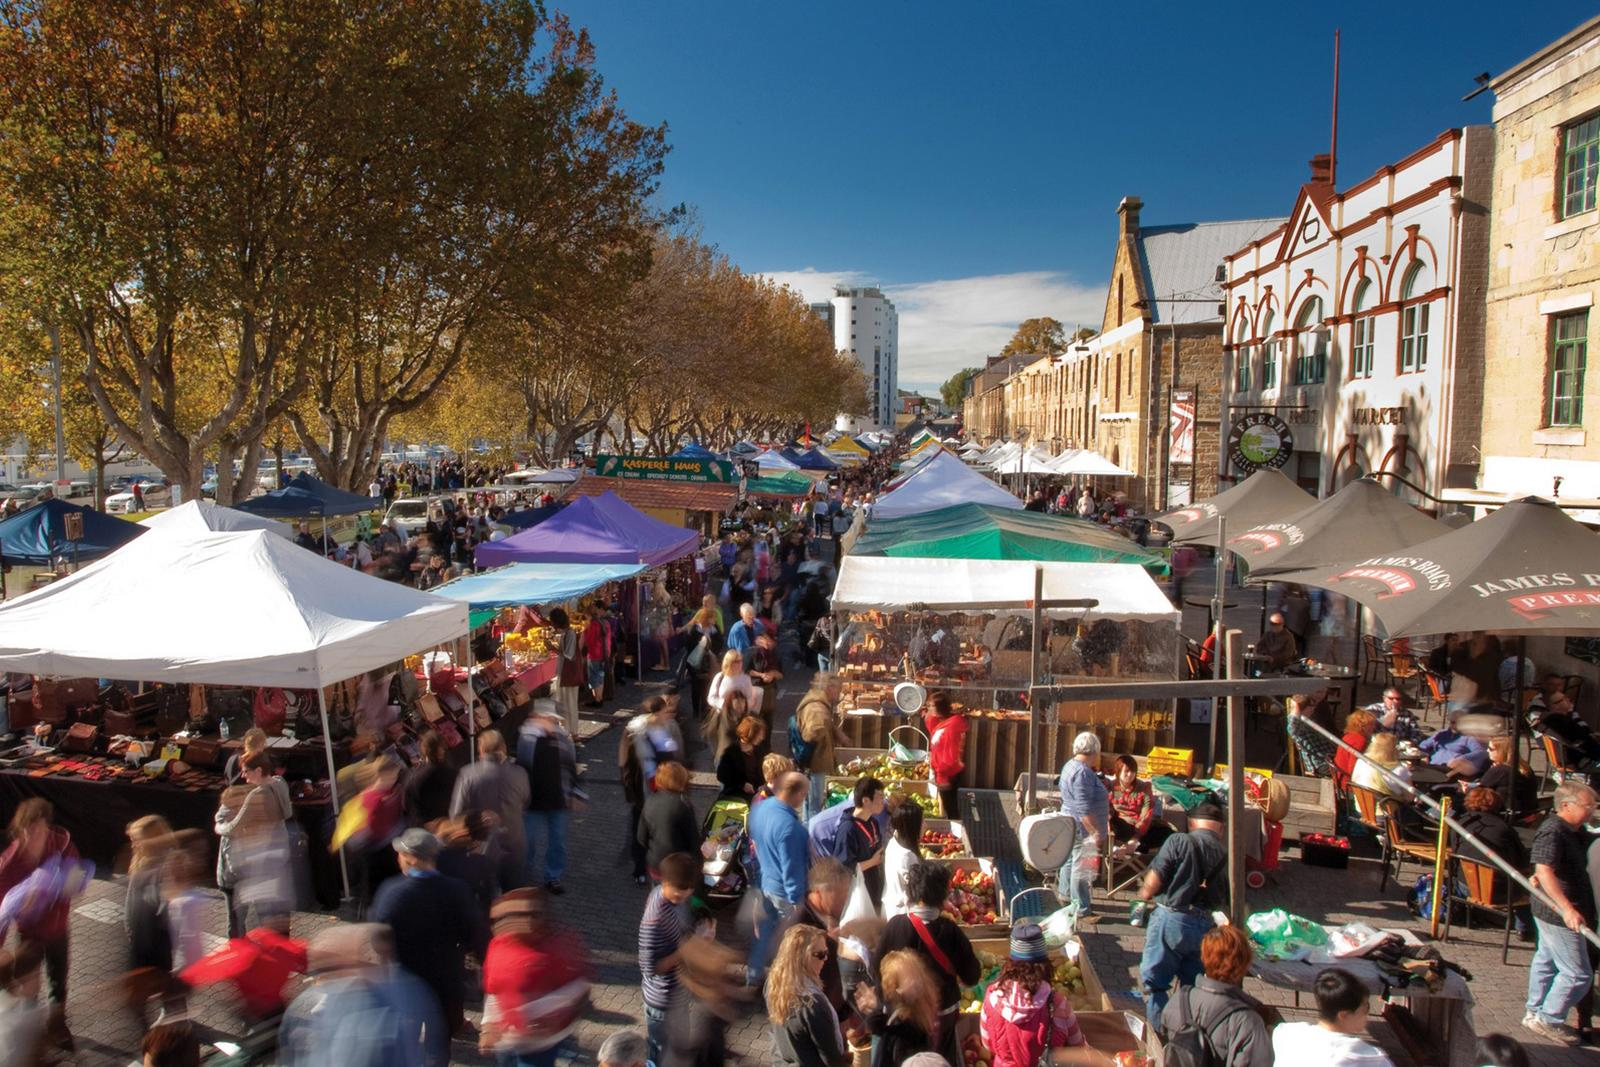 Crowds at Salamanca Market